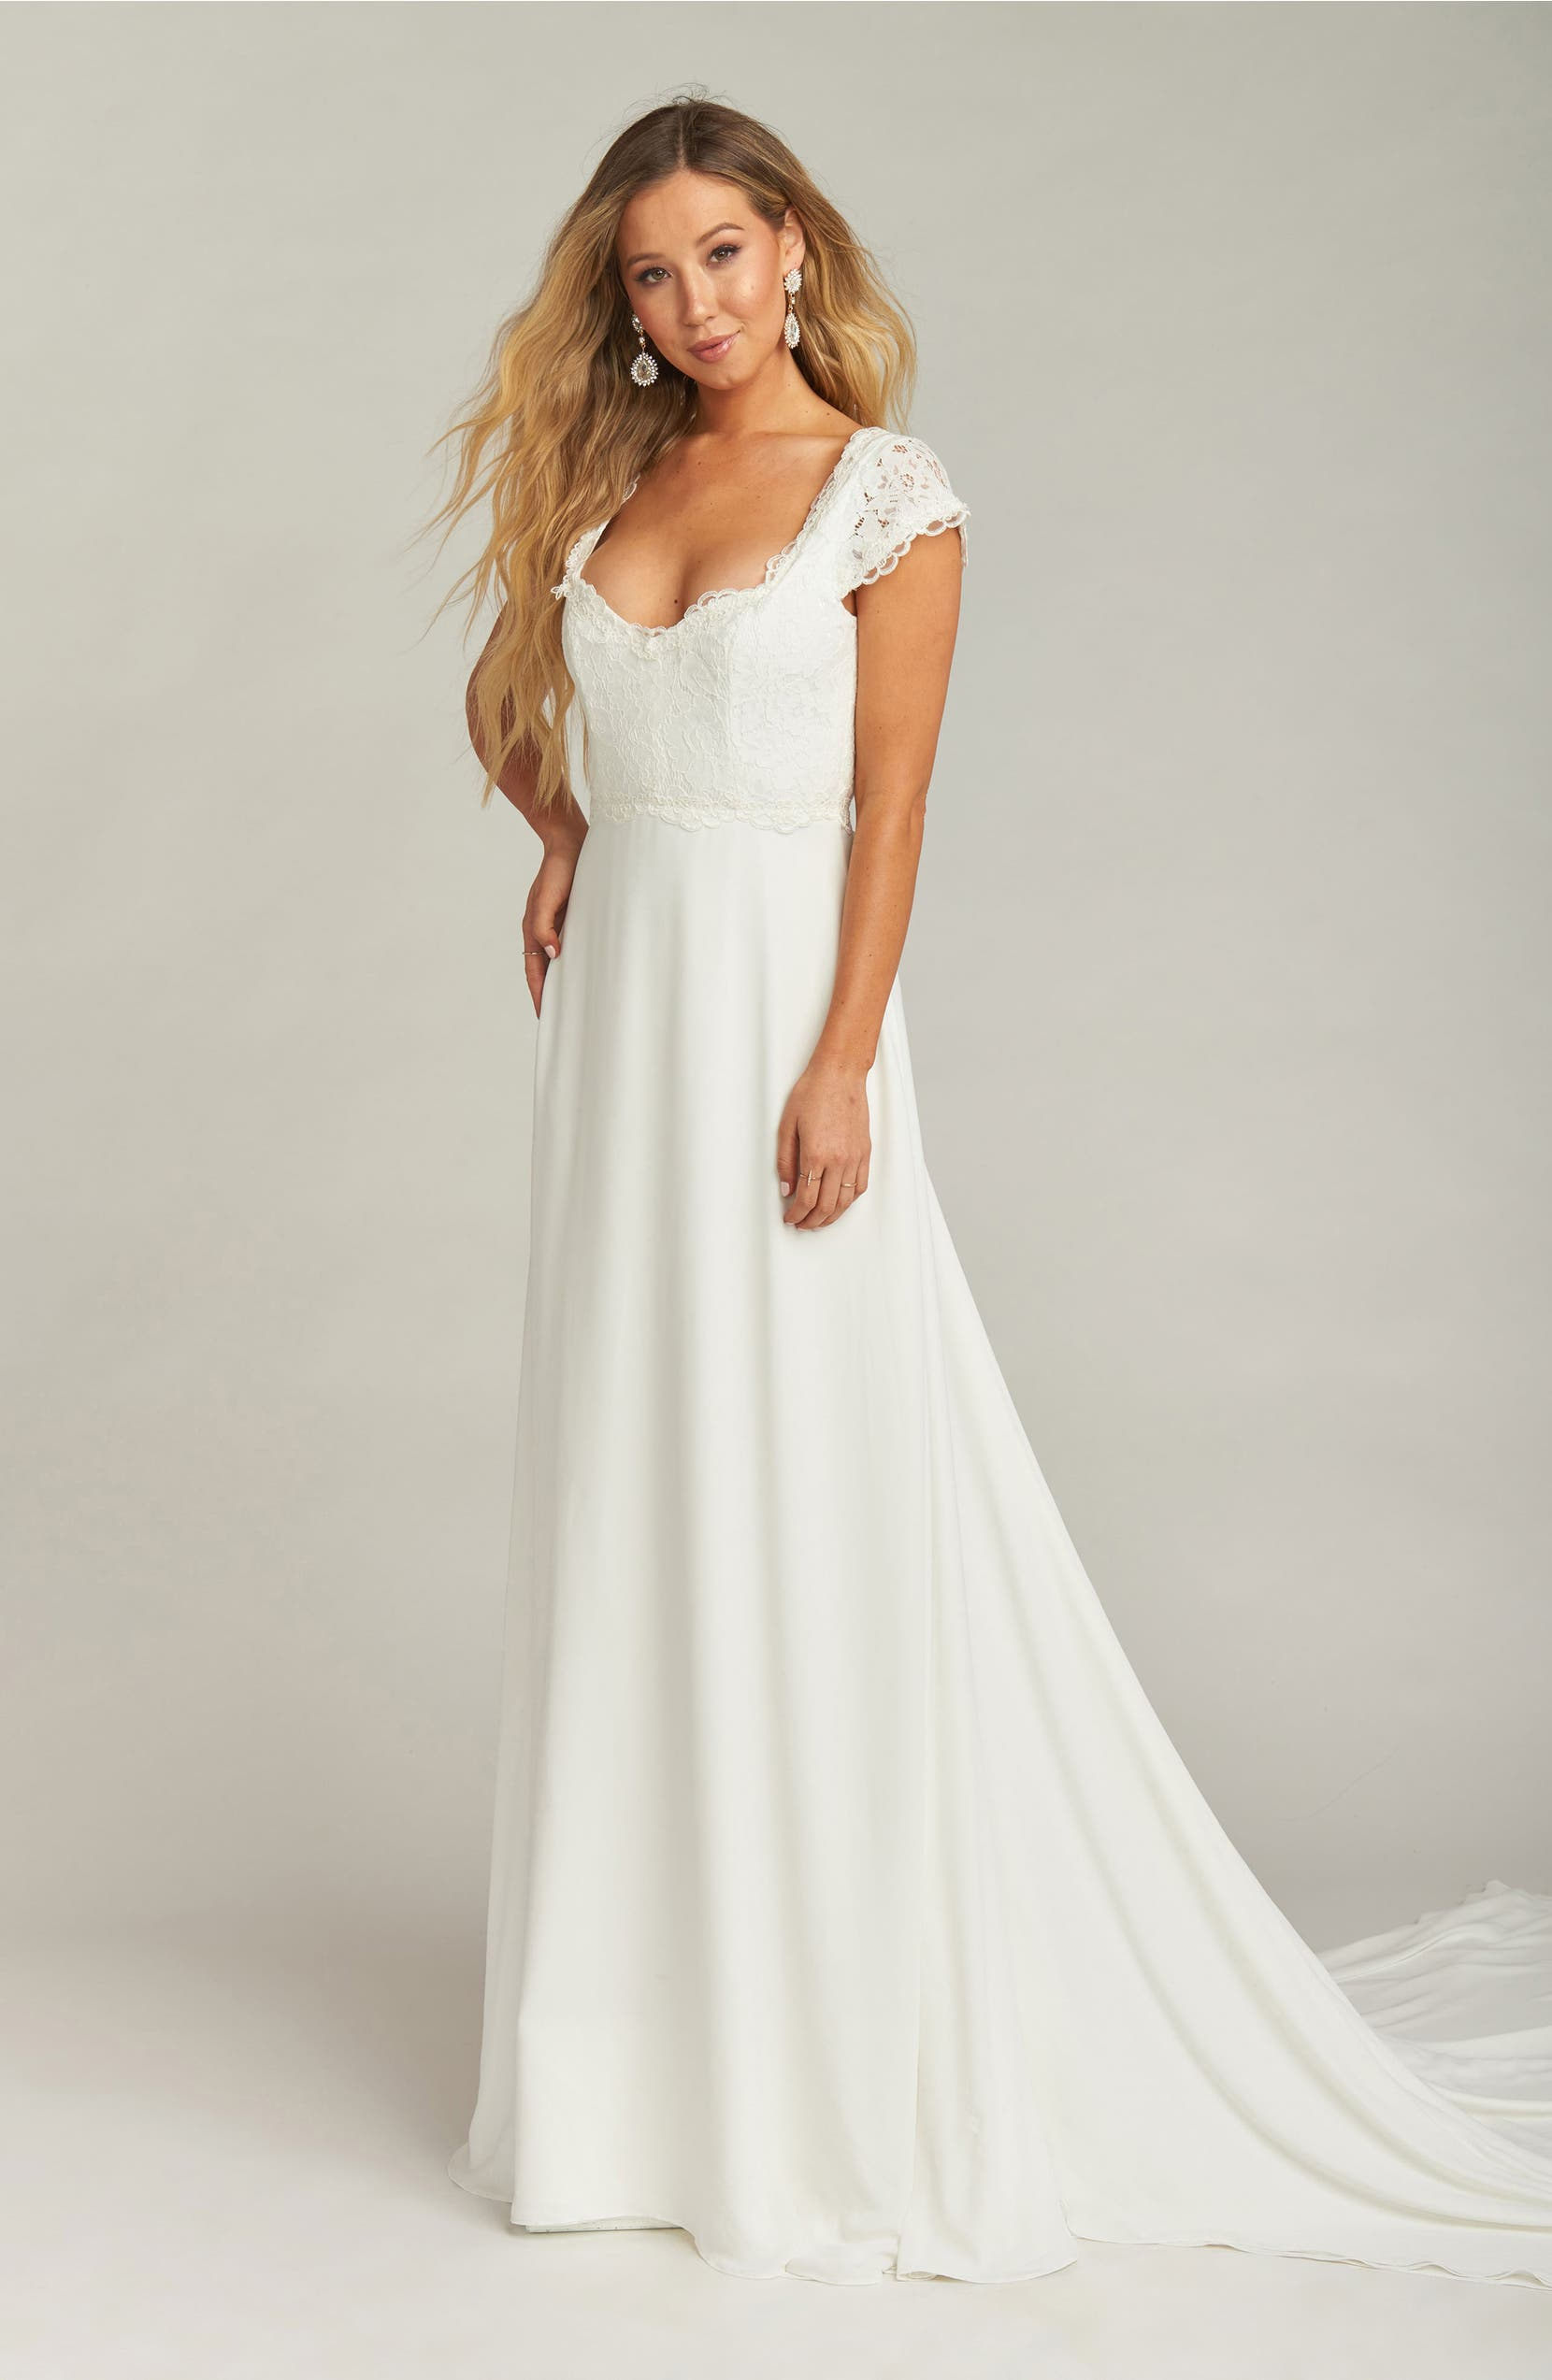 Show Me Your Mumu Chantel Lace Bodice Cap Sleeve Wedding Dress